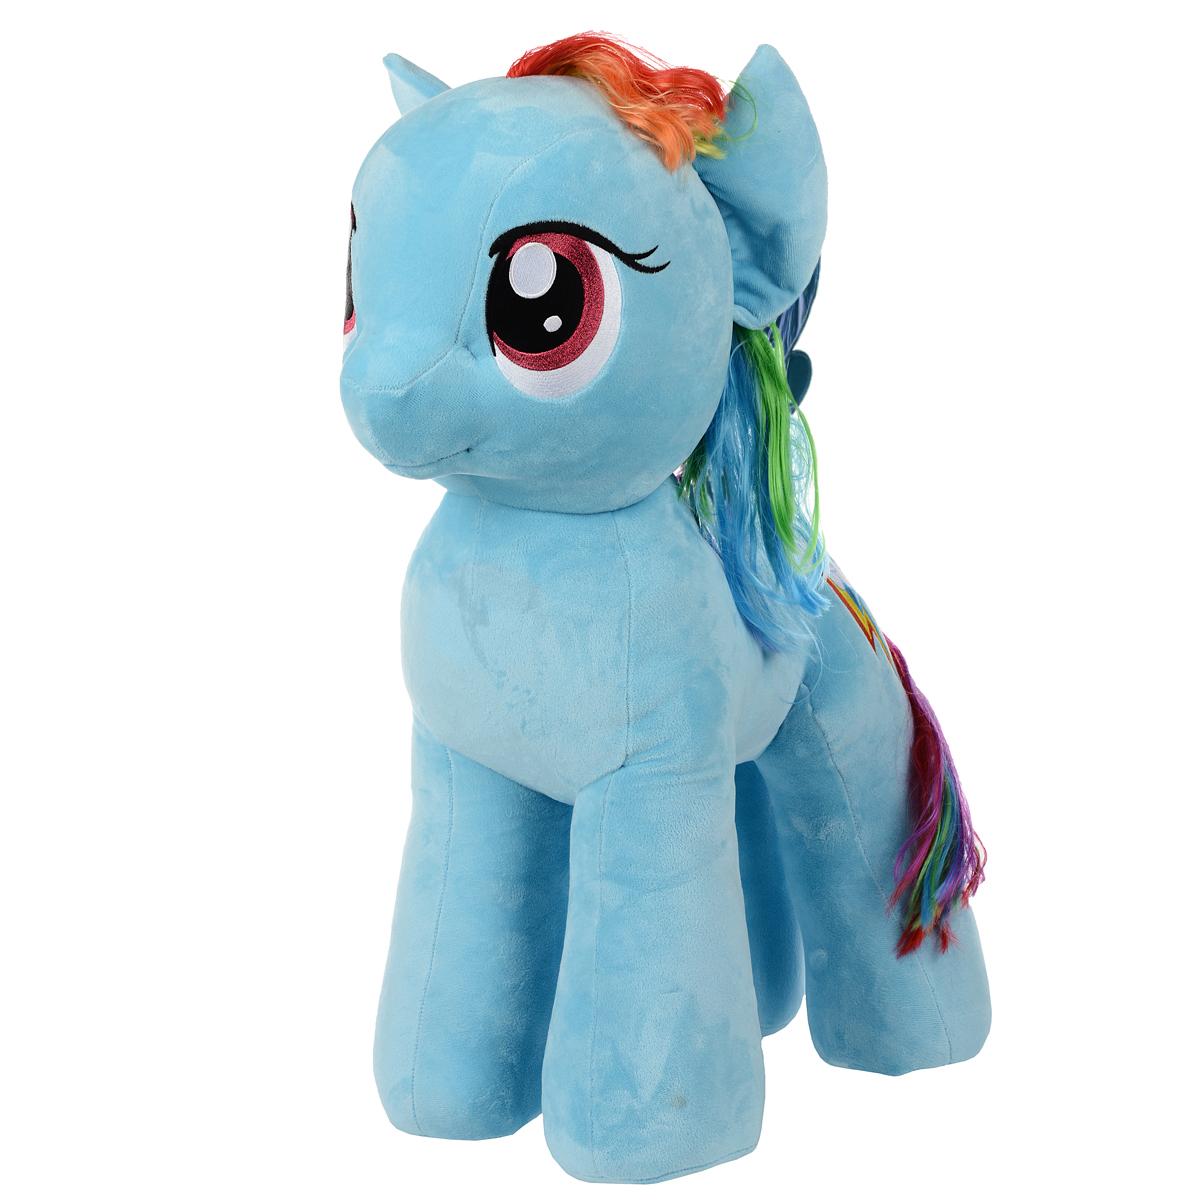 My Little Pony Мягкая игрушка Пони Rainbow Dash, 76 см мульти пульти мягкая игрушка принцесса луна 18 см со звуком my little pony мульти пульти